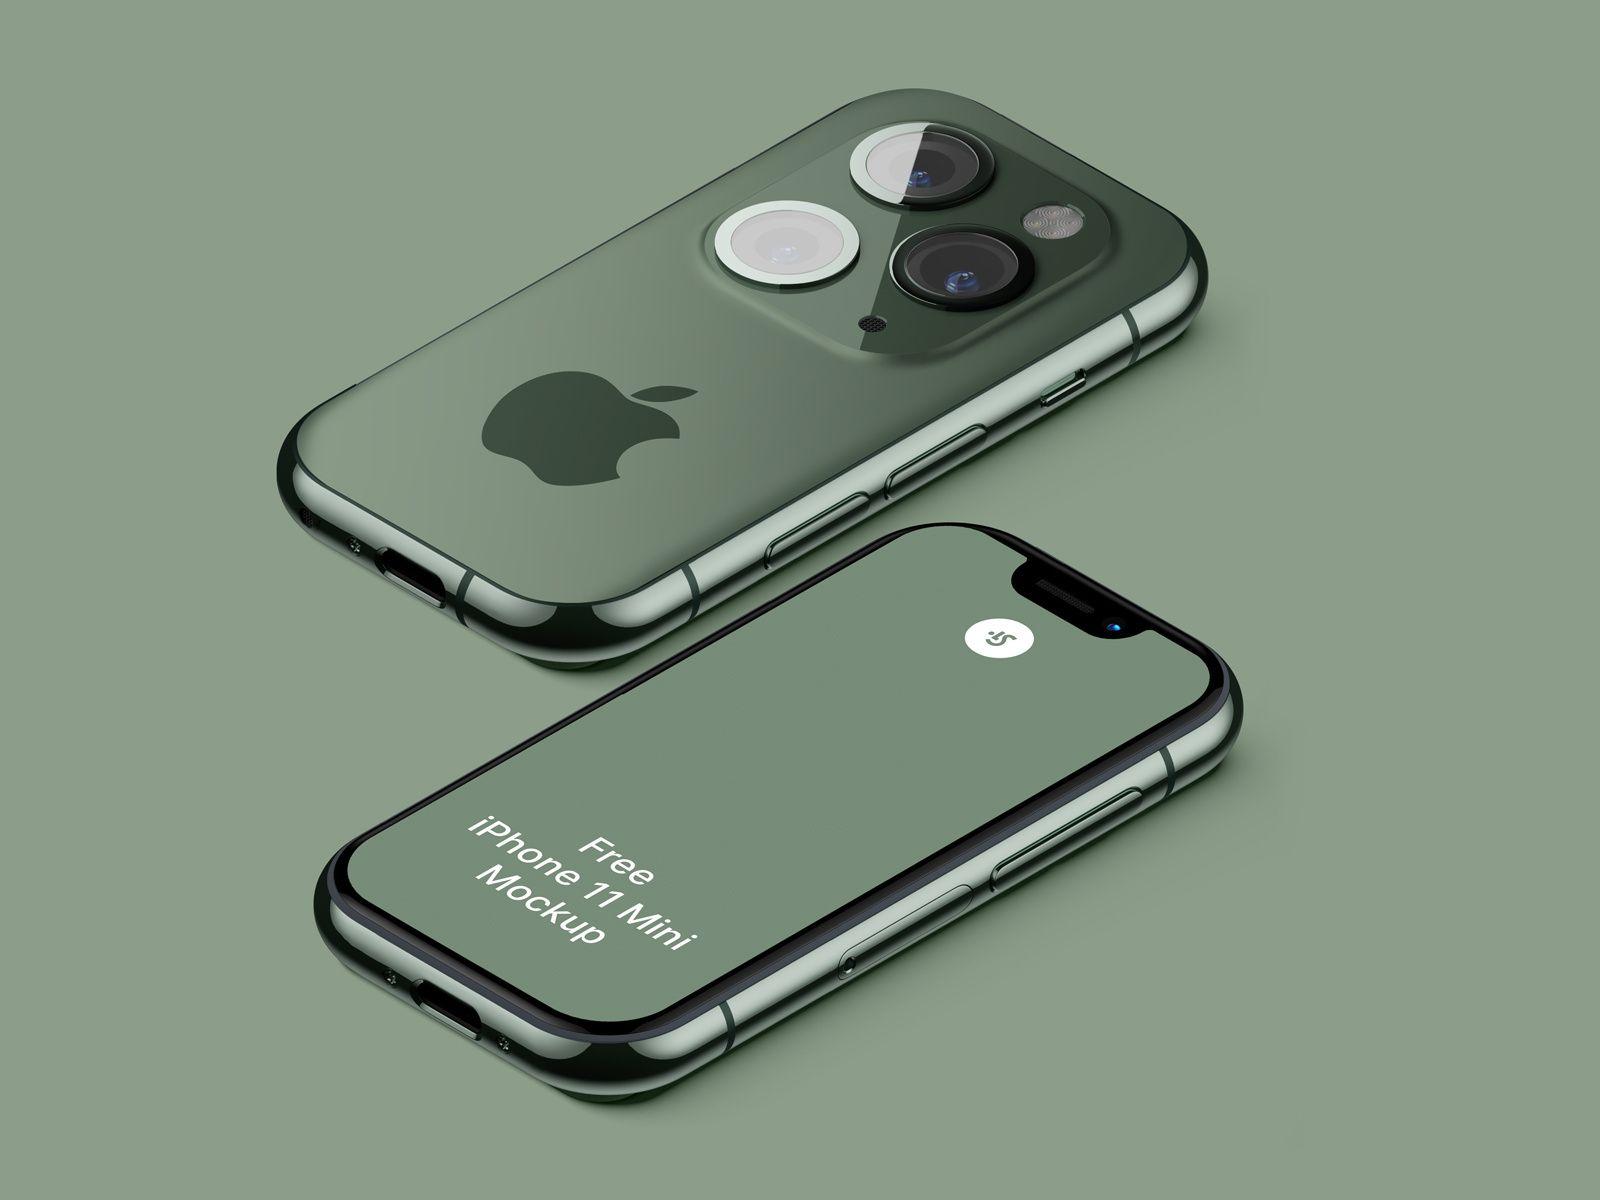 Iphone 11 Mini Leak Iphone Iphone 11 New Technology Gadgets